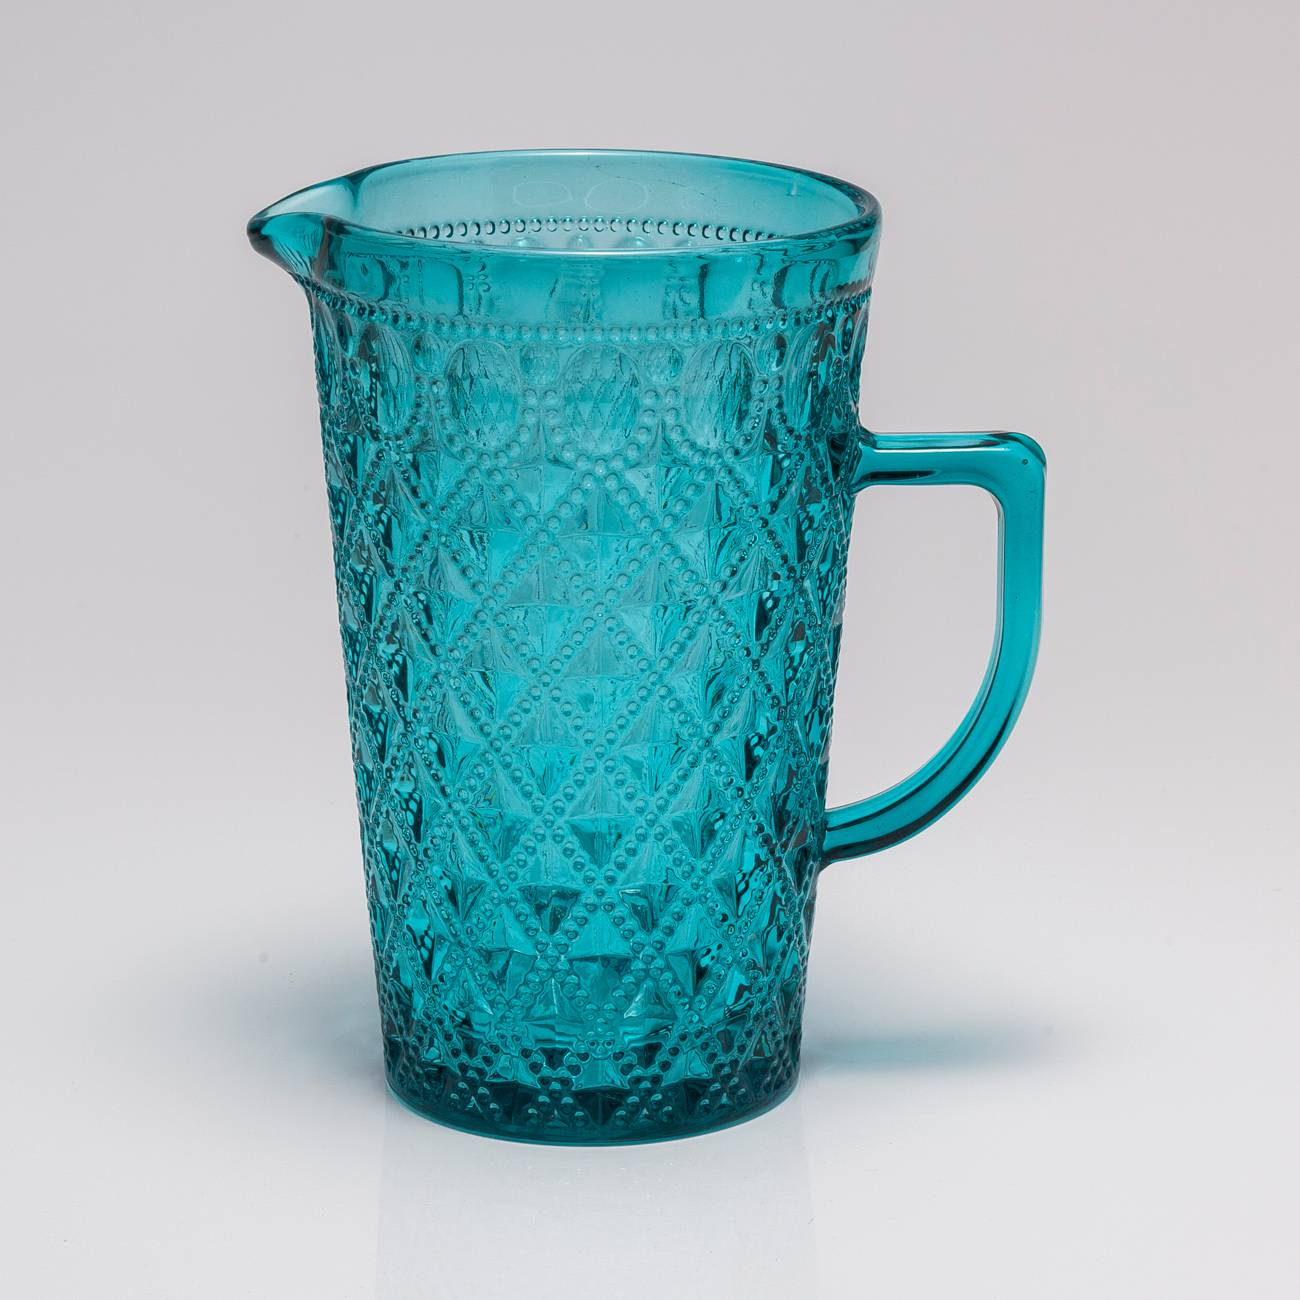 Jarra Diamond Azul - 1140 ml - em Vidro - Bon Gourmet